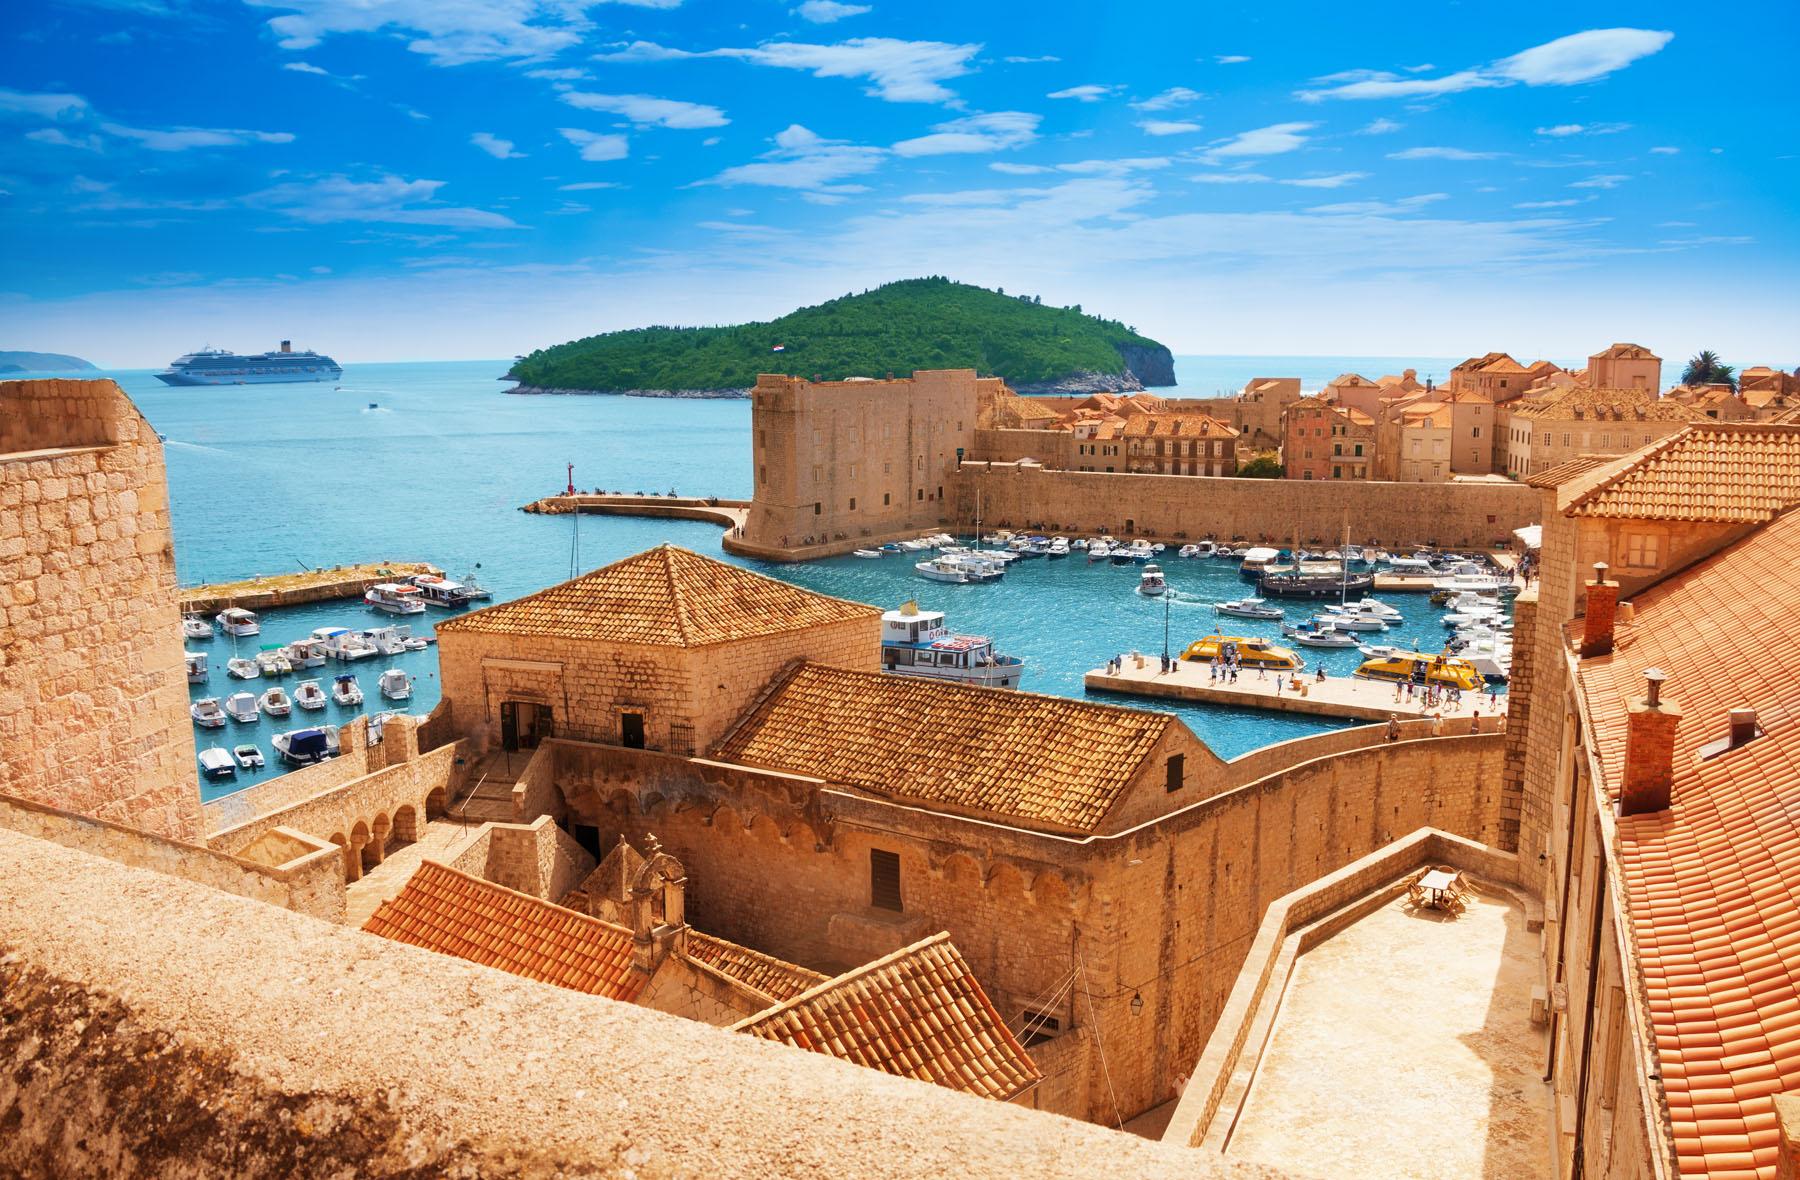 Croatia-Dubrovnik_54921384